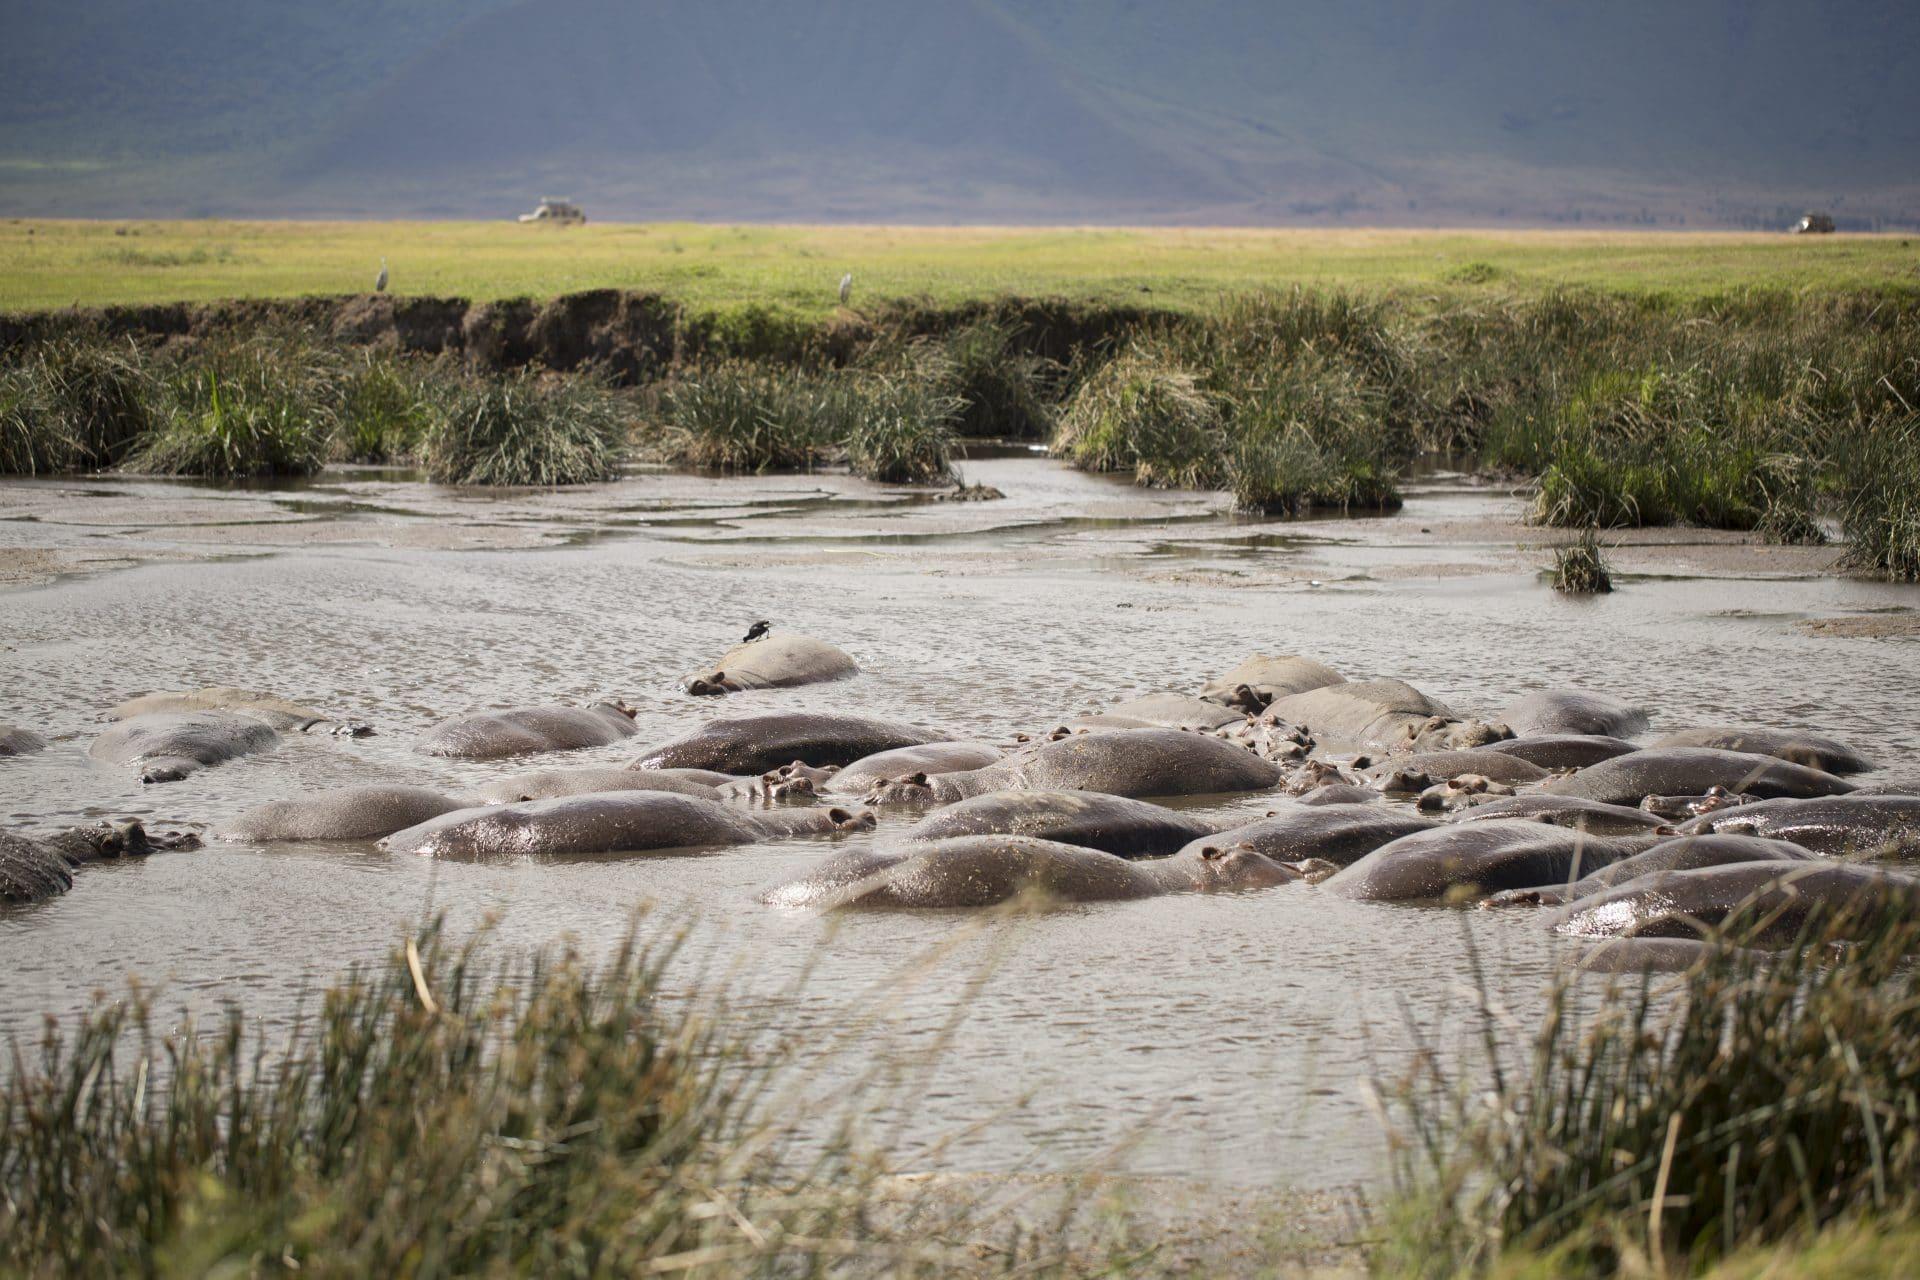 Hippos on safari trip to Tanzania